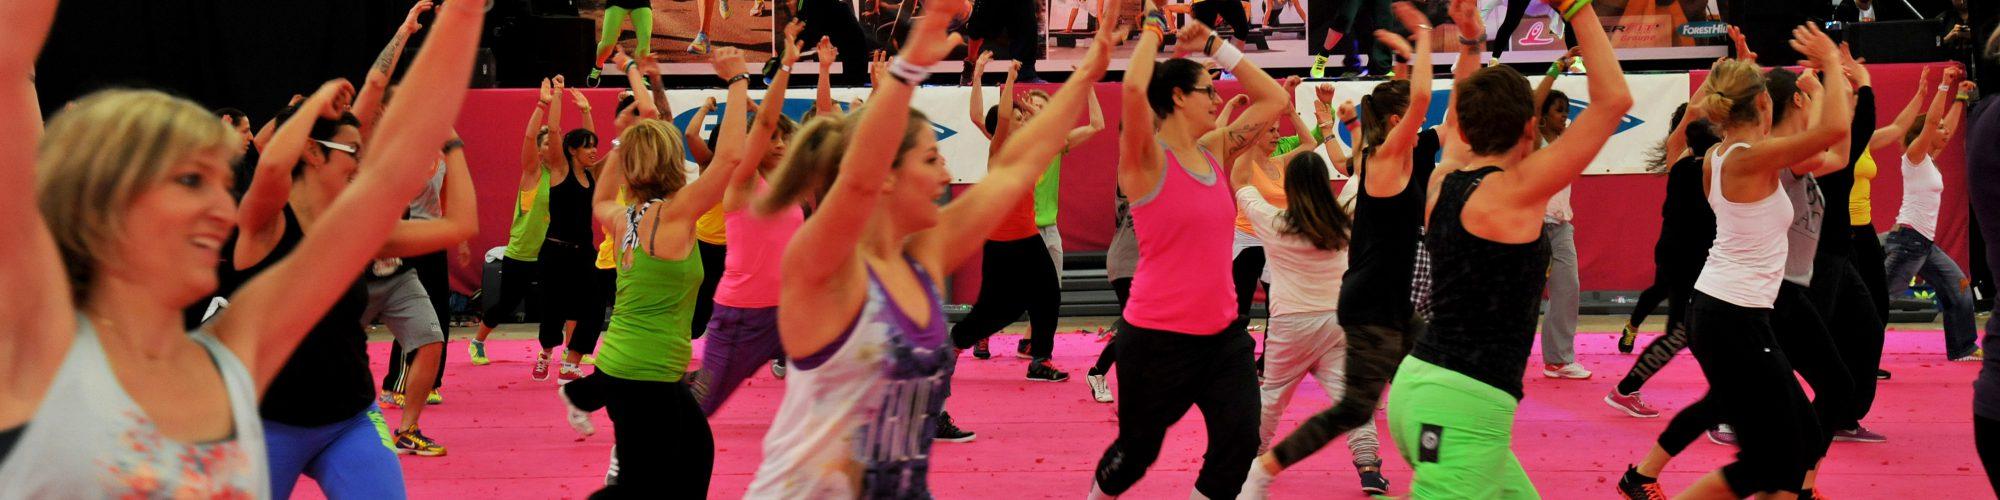 Salon body fitness paris 2016 body concept training - Salon body body paris ...